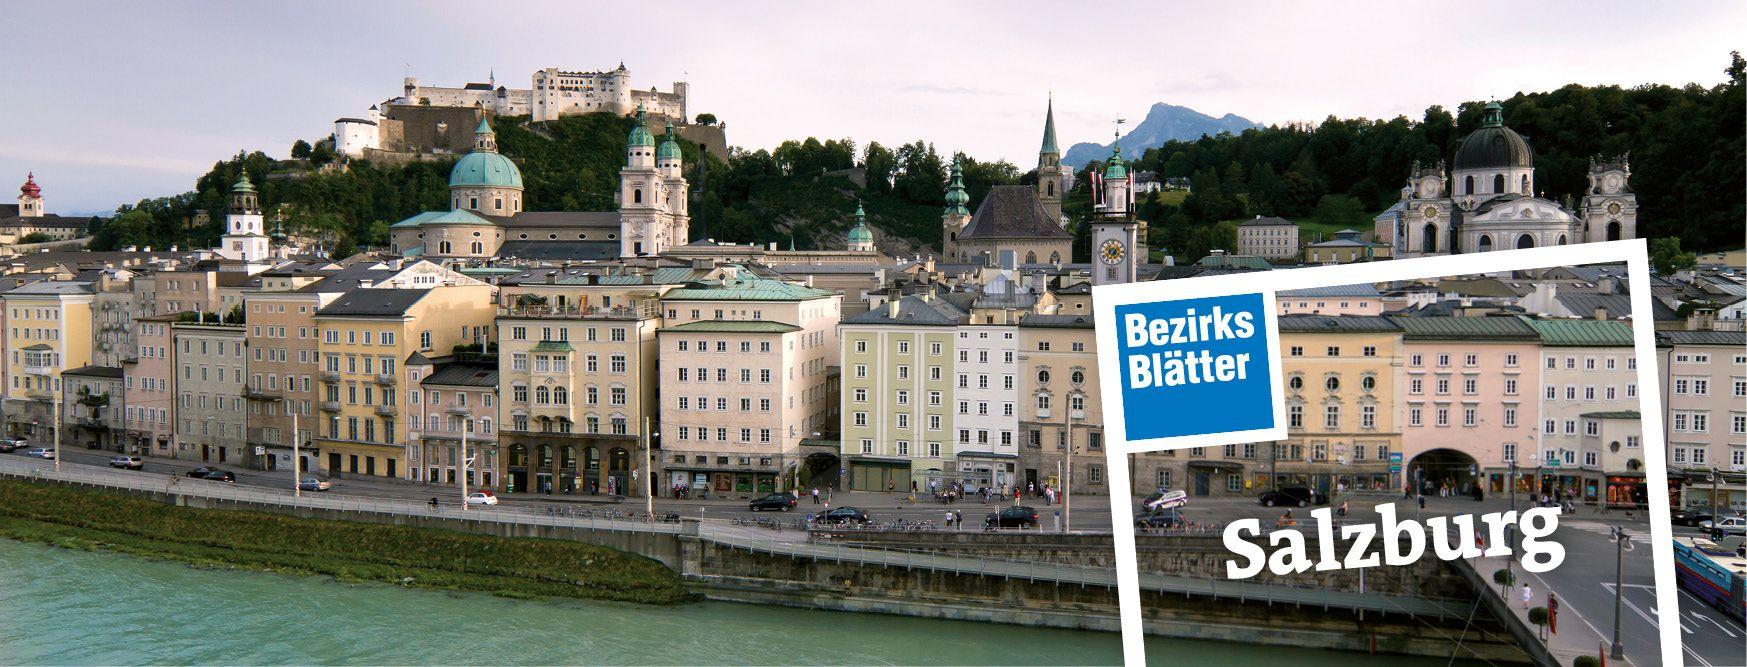 Bezirksblätter Salzburg: Tarif, Kontakt, E-Paper, meinbezirk.at, Mediadaten, Streuliste, Beilagen, Technische Daten